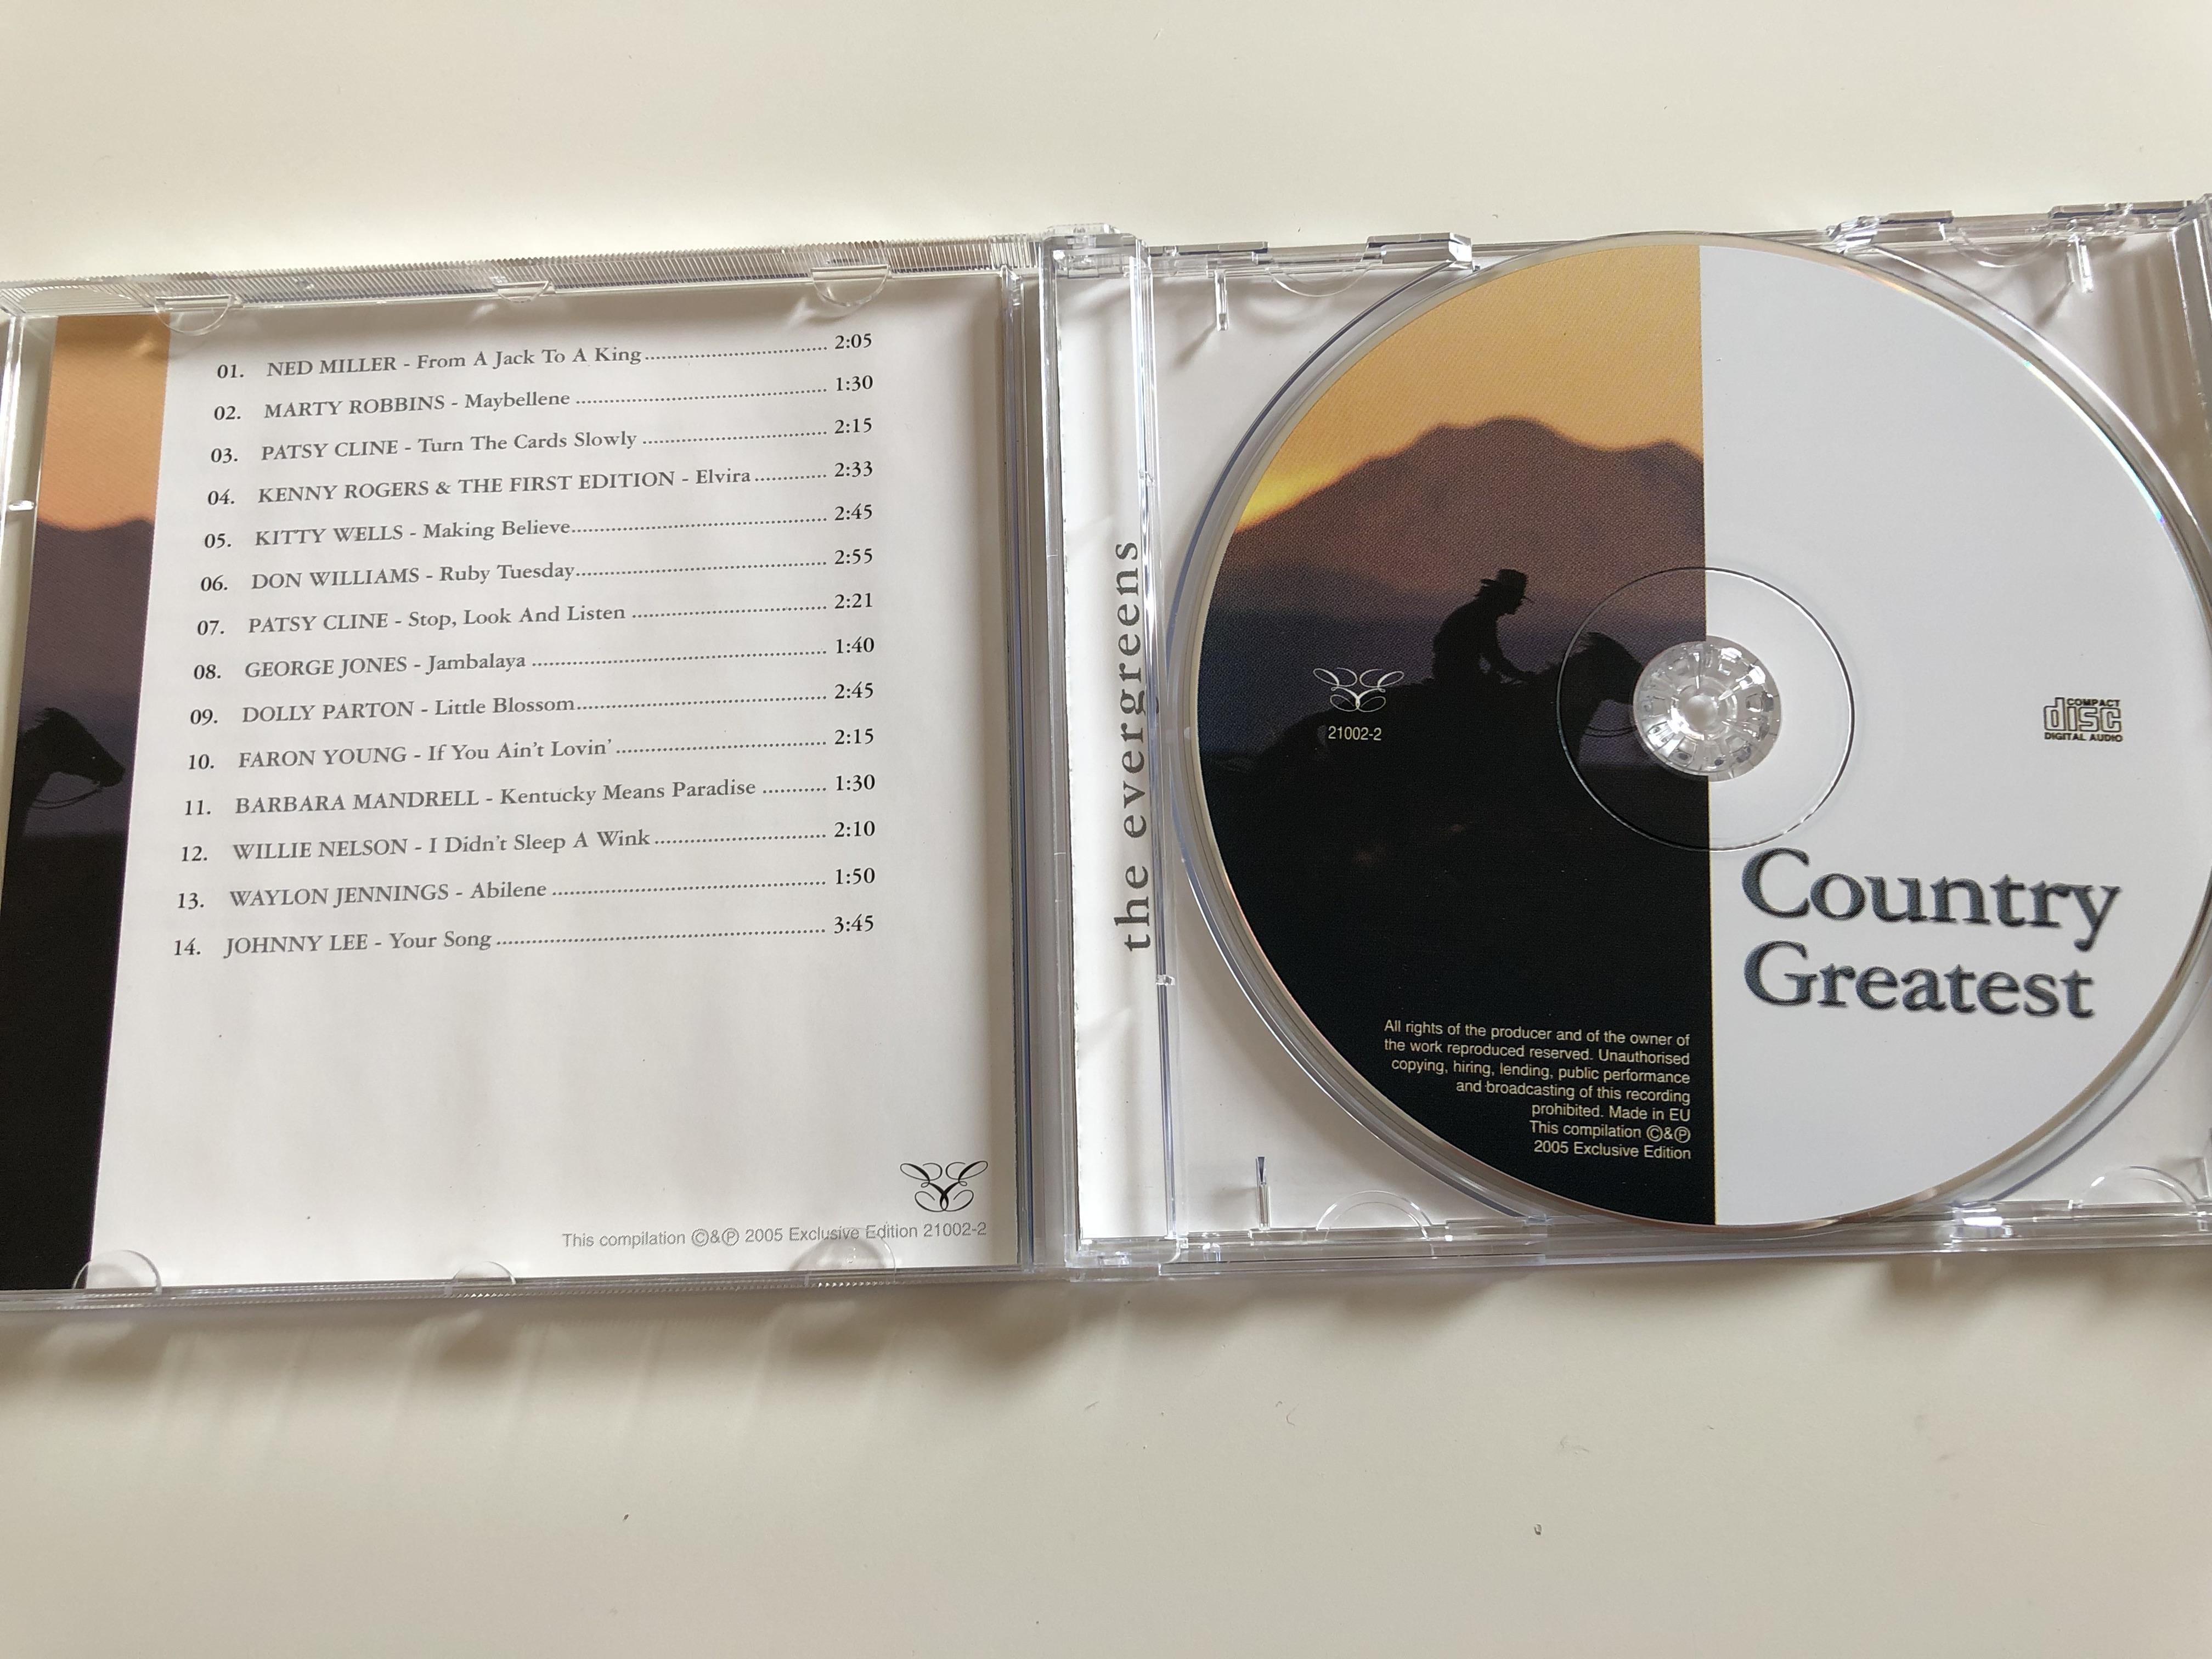 country-greatestimg-2217.jpg